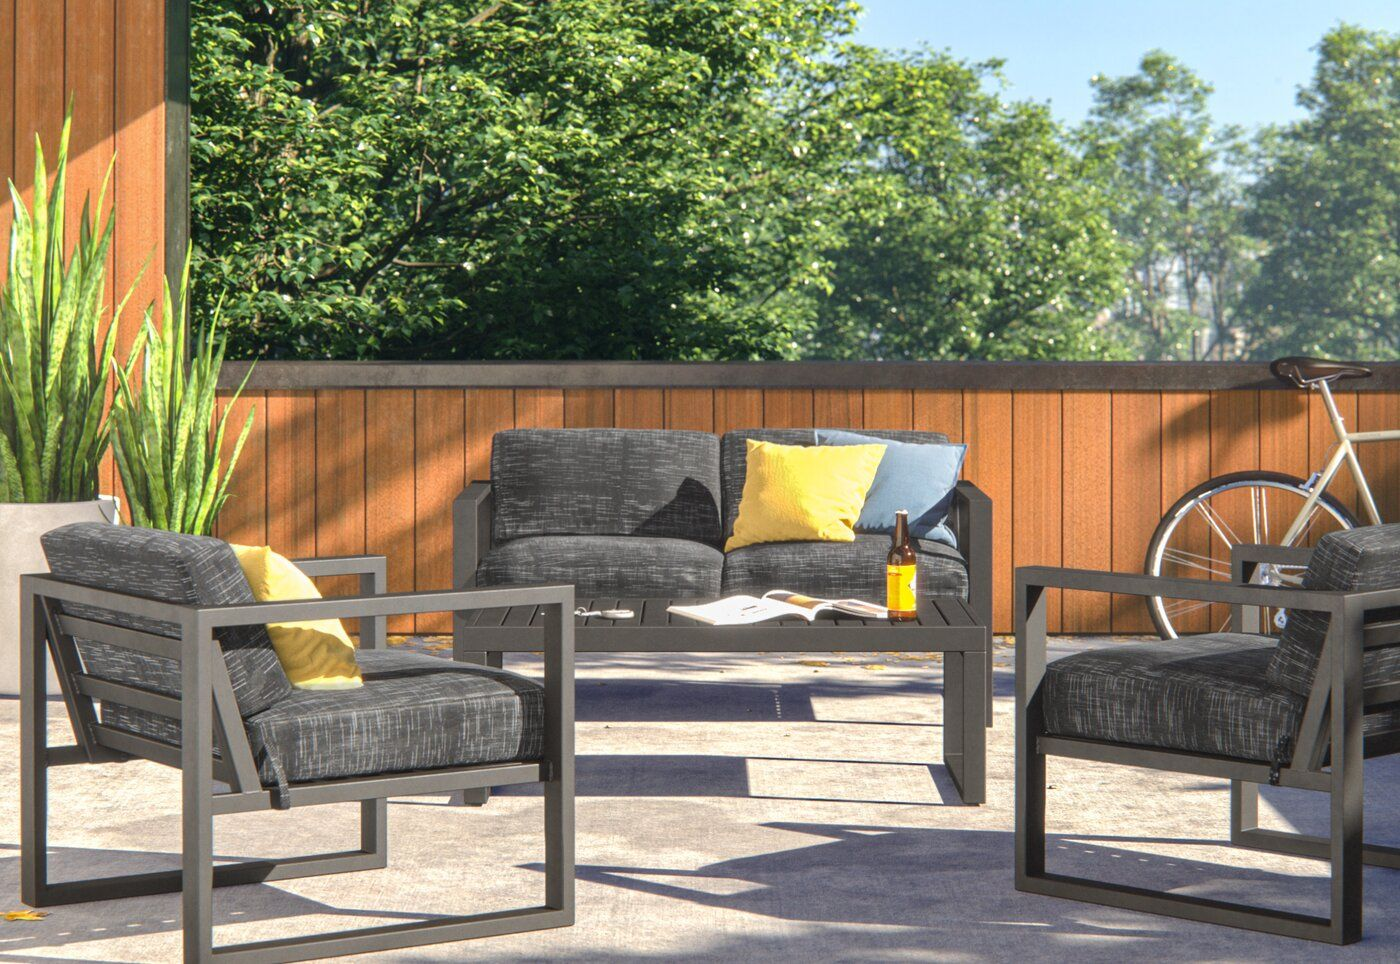 Mirando 4 Piece Sofa Set With Cushions Reviews Allmodern Outdoor Sofa Sets Seating Groups Sofa Set